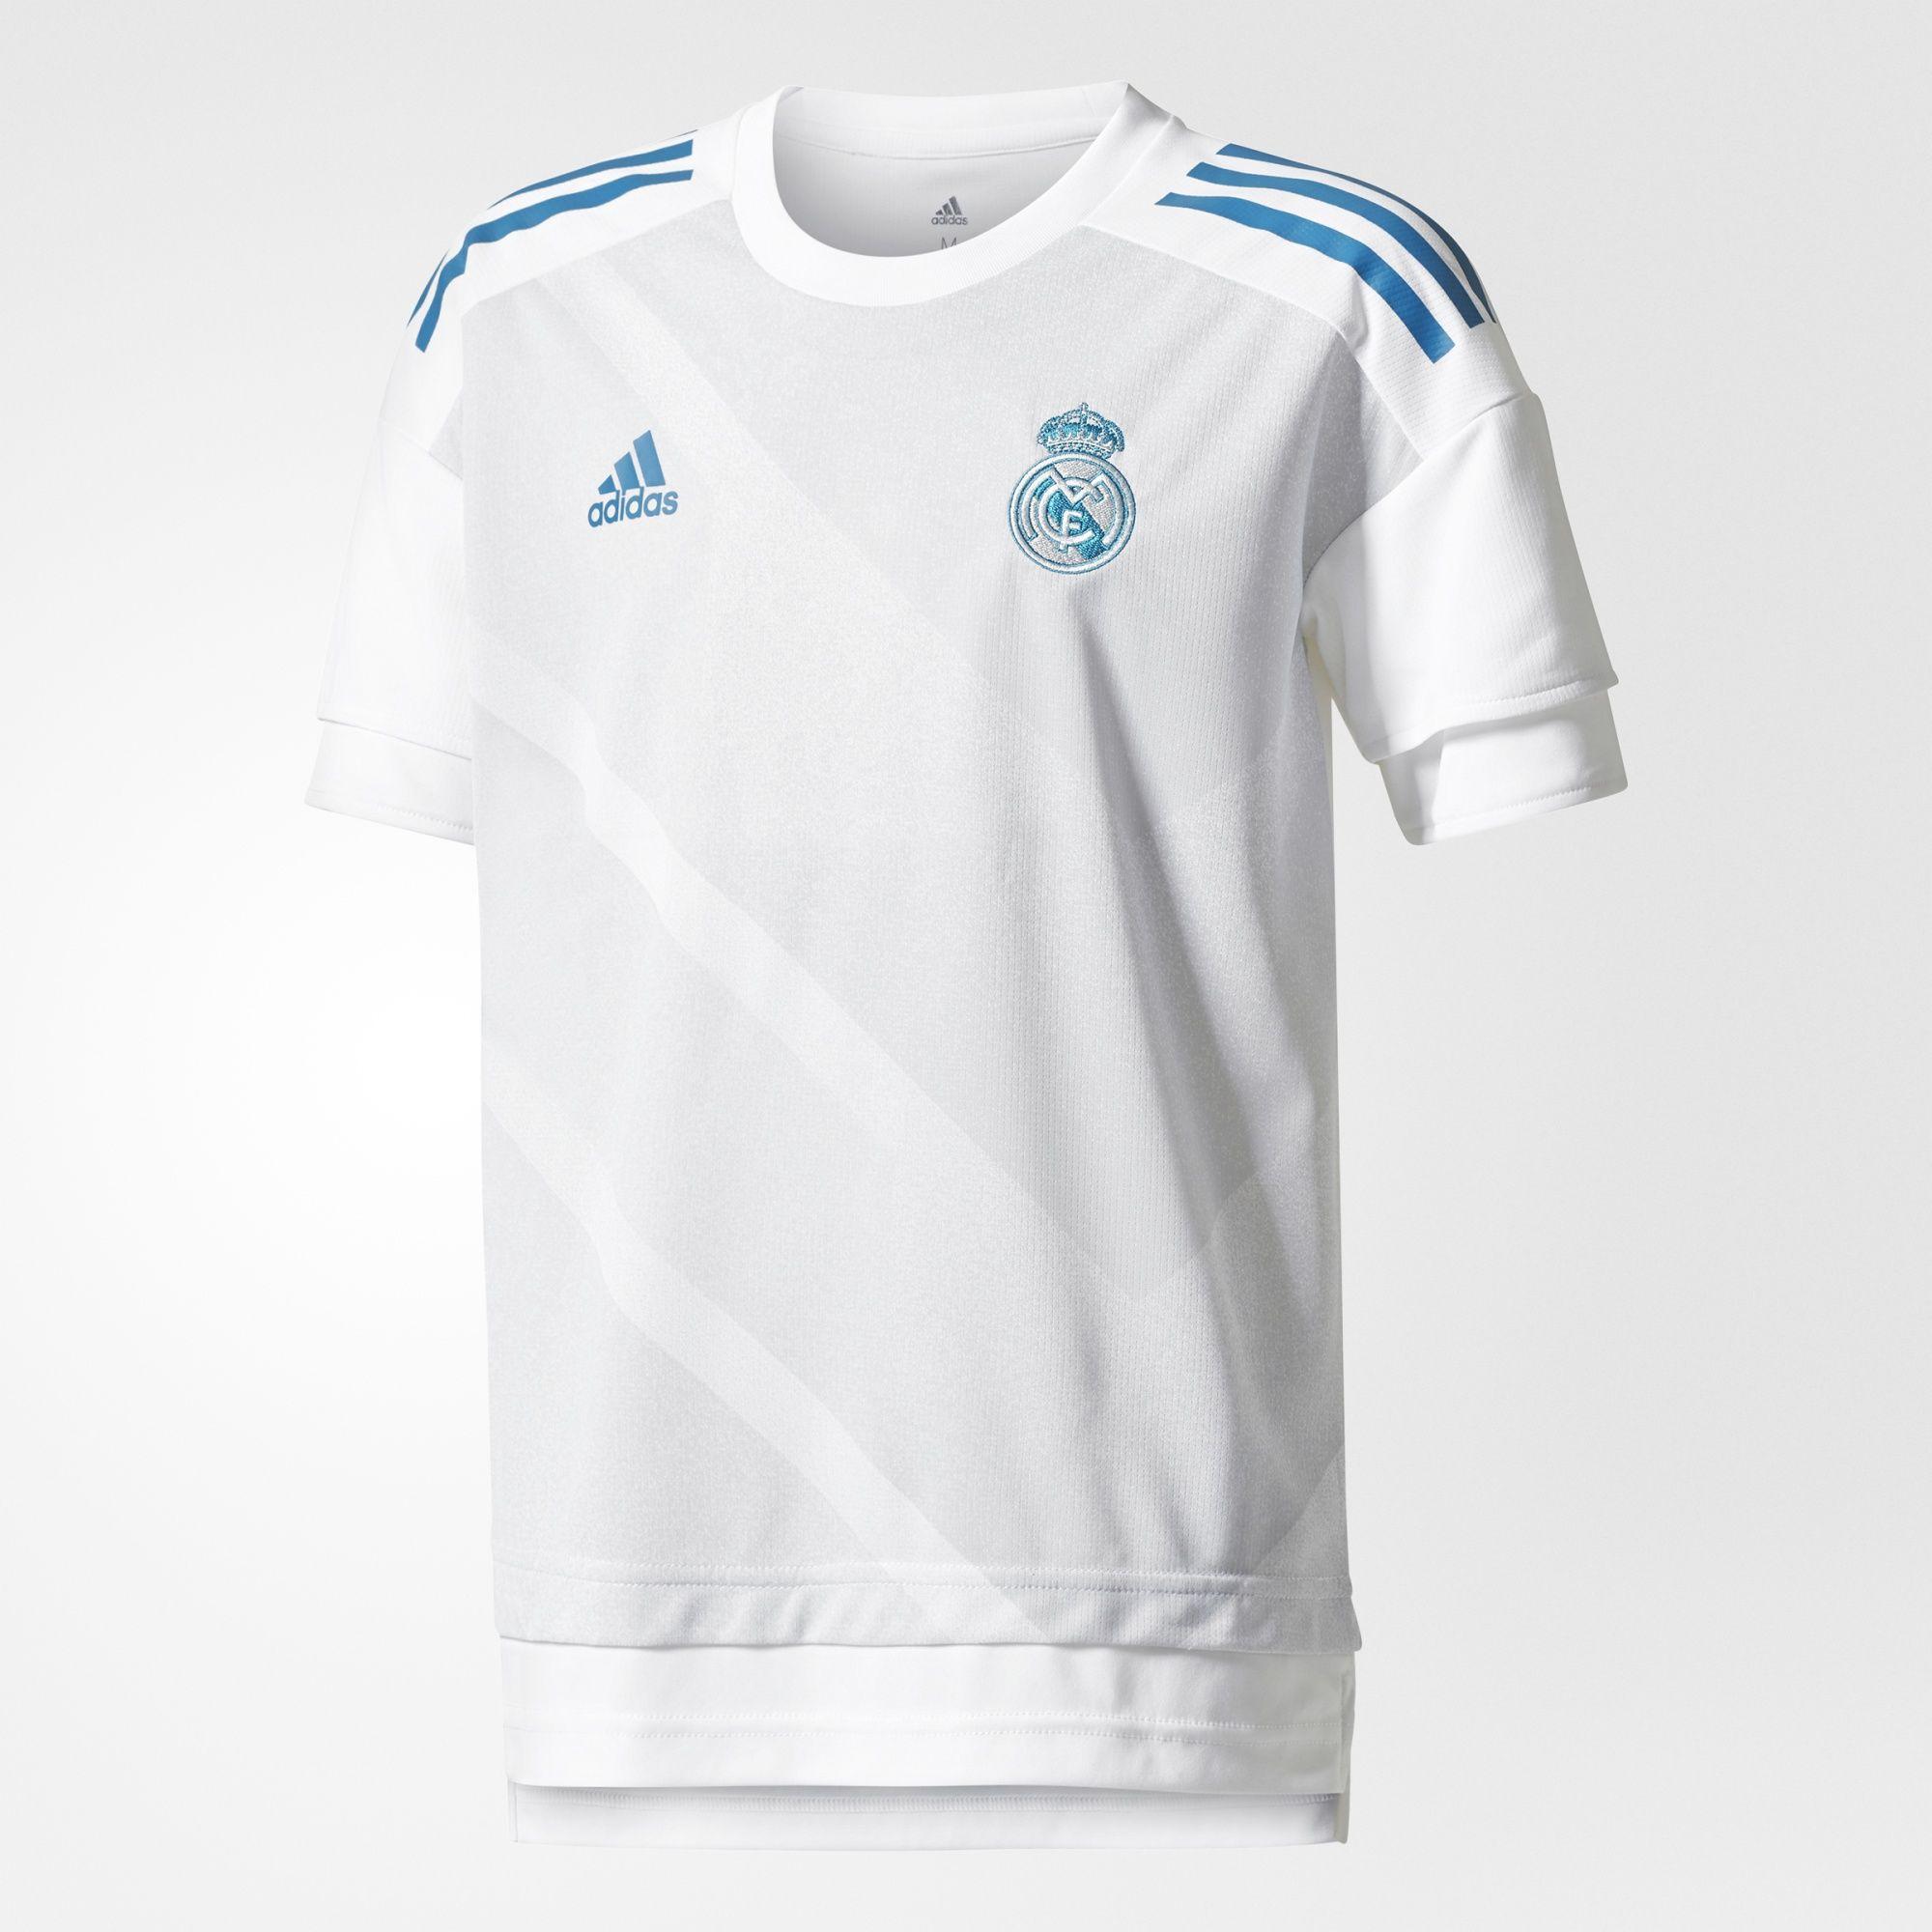 db6e46fb5 adidas Real Madrid Home Pre-Match Jsy Youth 17 18